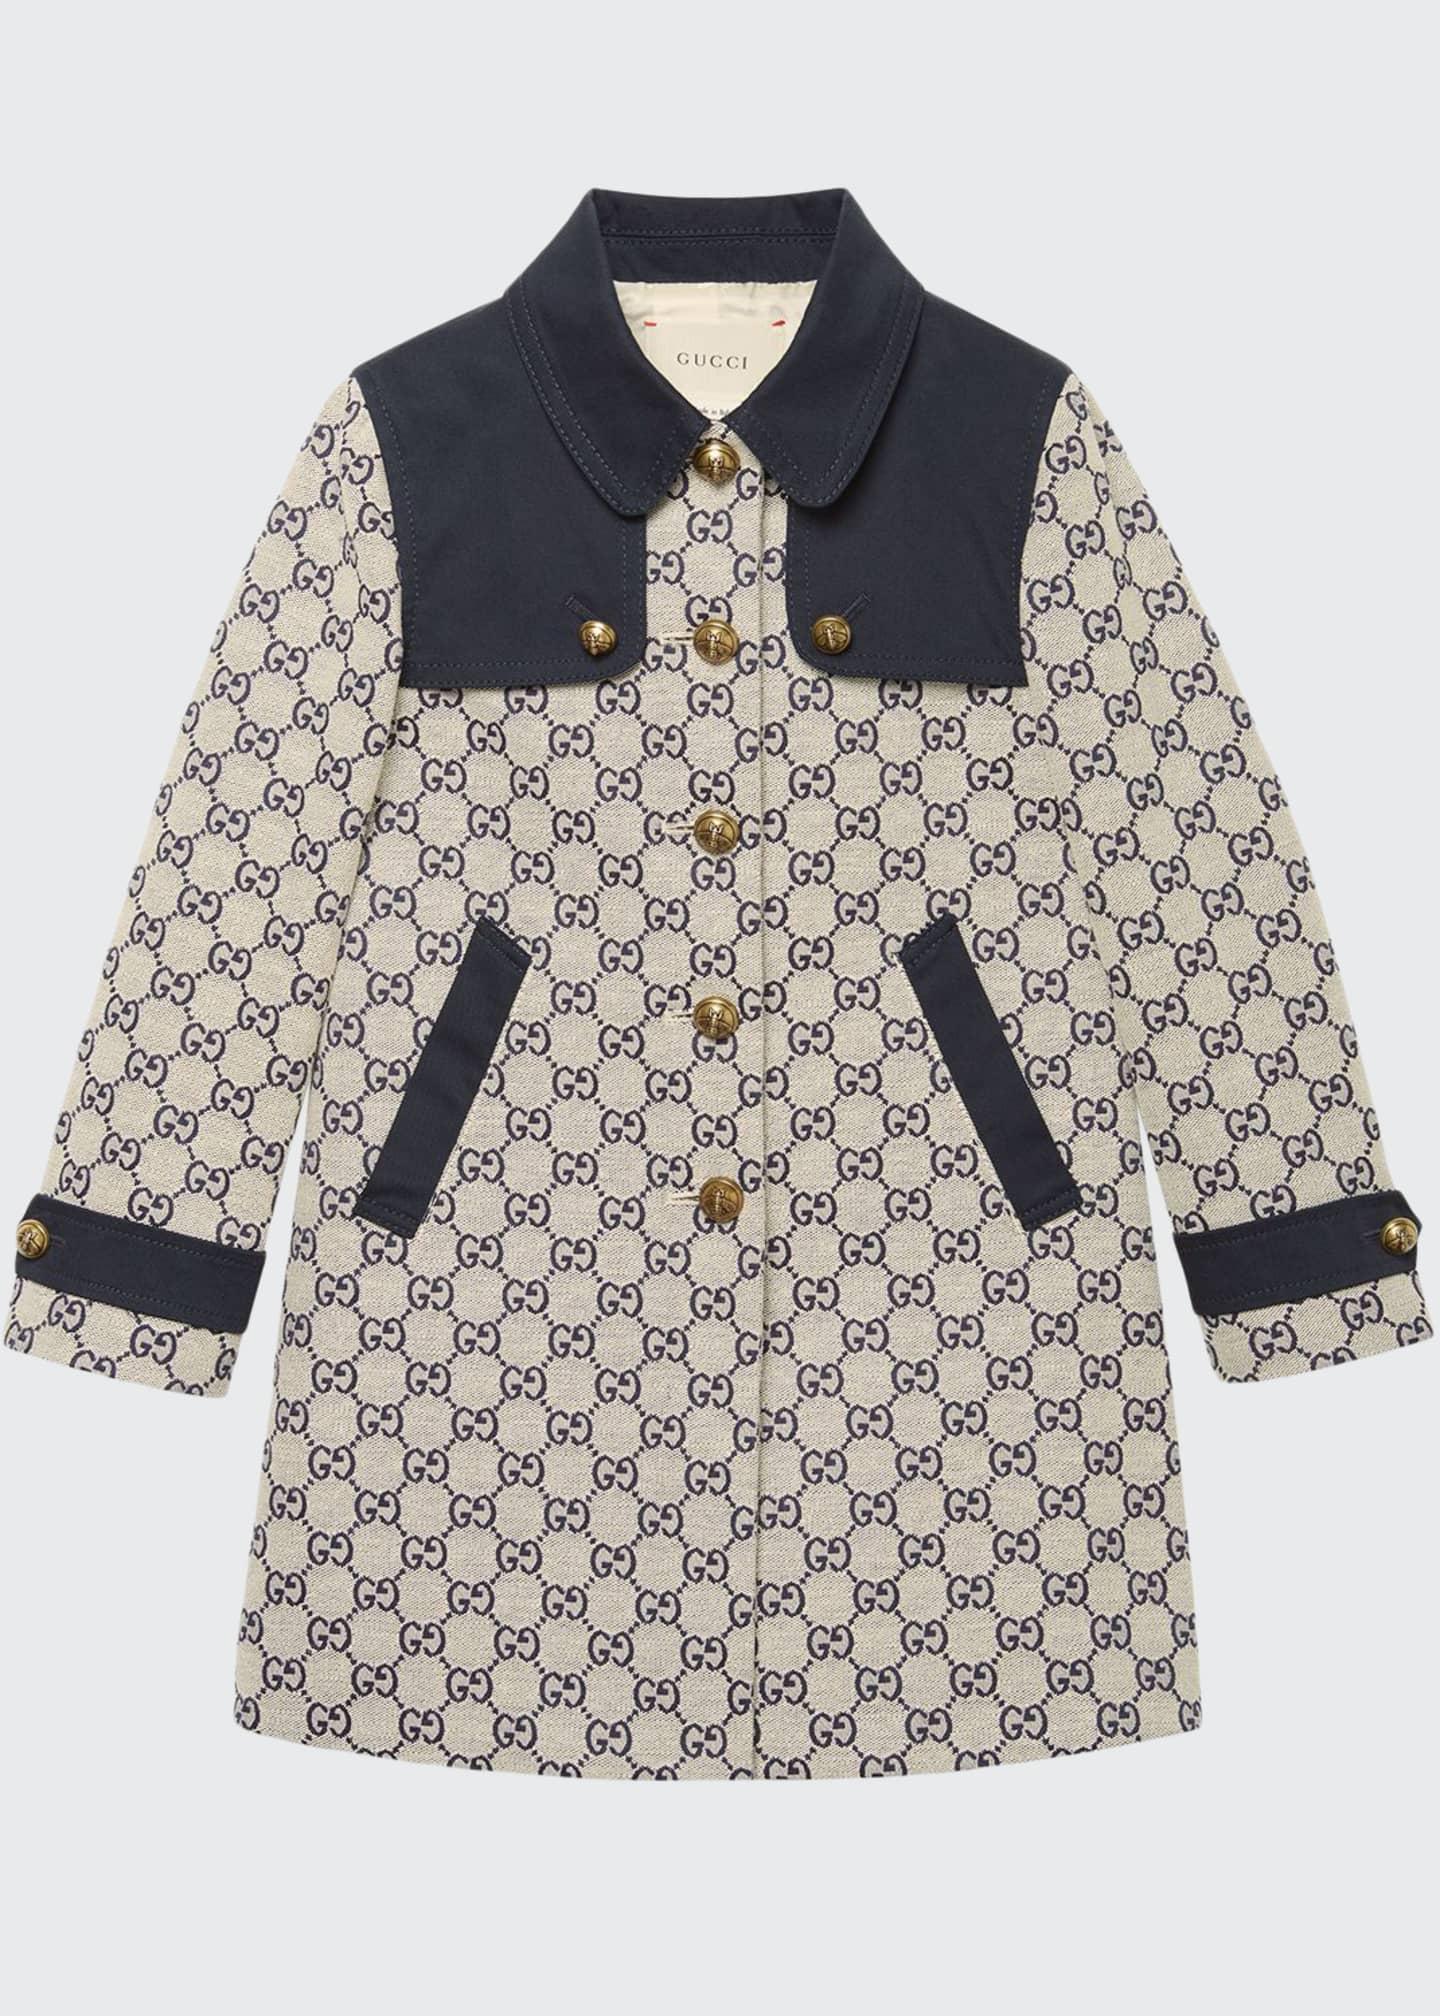 Gucci GG Jacquard Gabardine Long Coat, Size 4-12